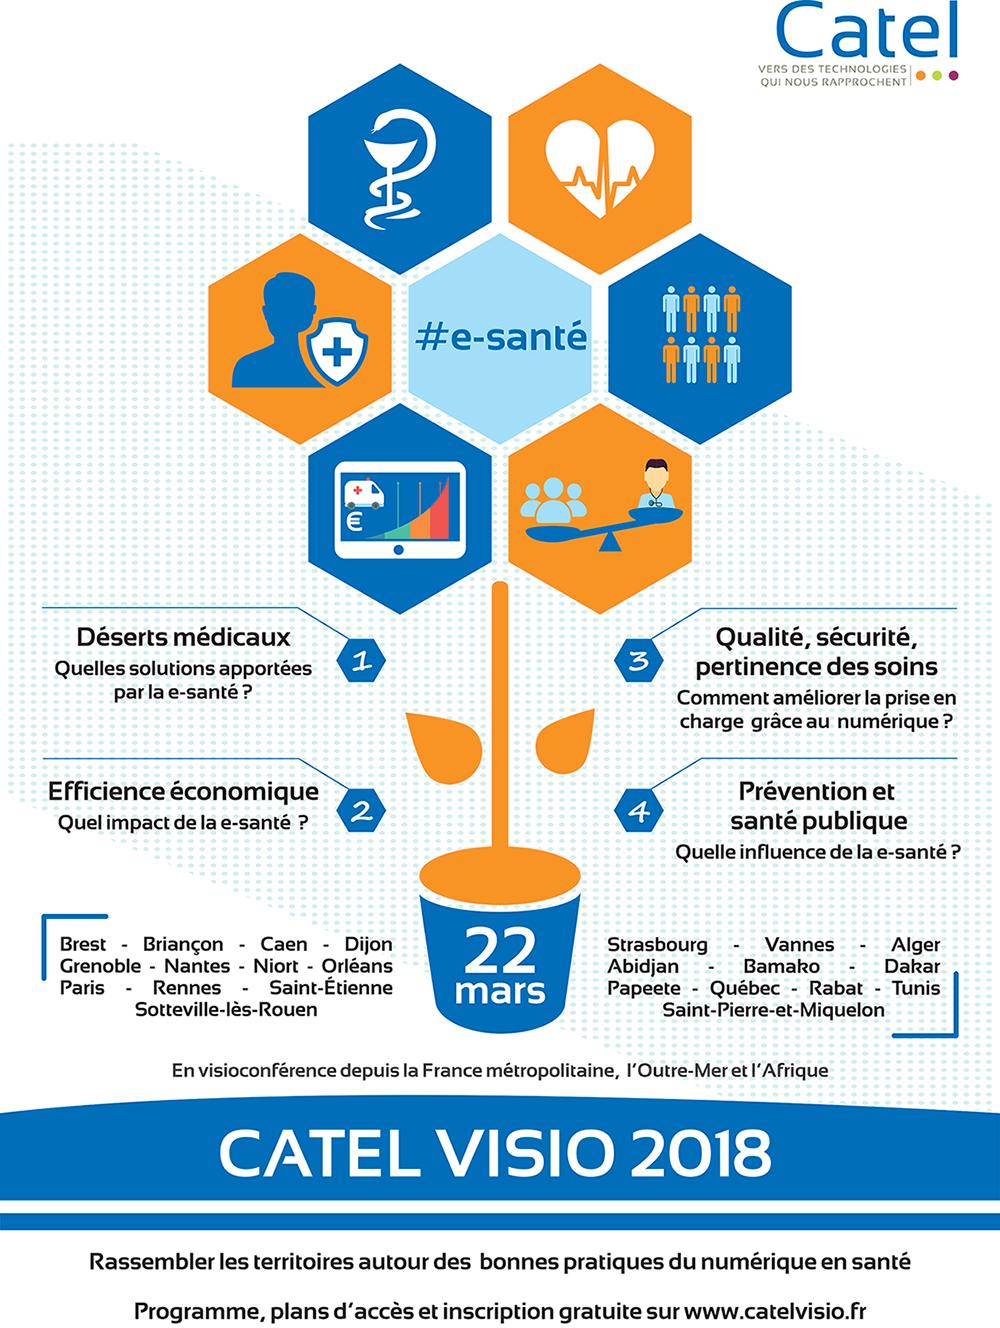 http://www.catel.pro/documents/2018/CATELVISIO/Affiche-CATEL-VISIO-2018-webHD.jpg